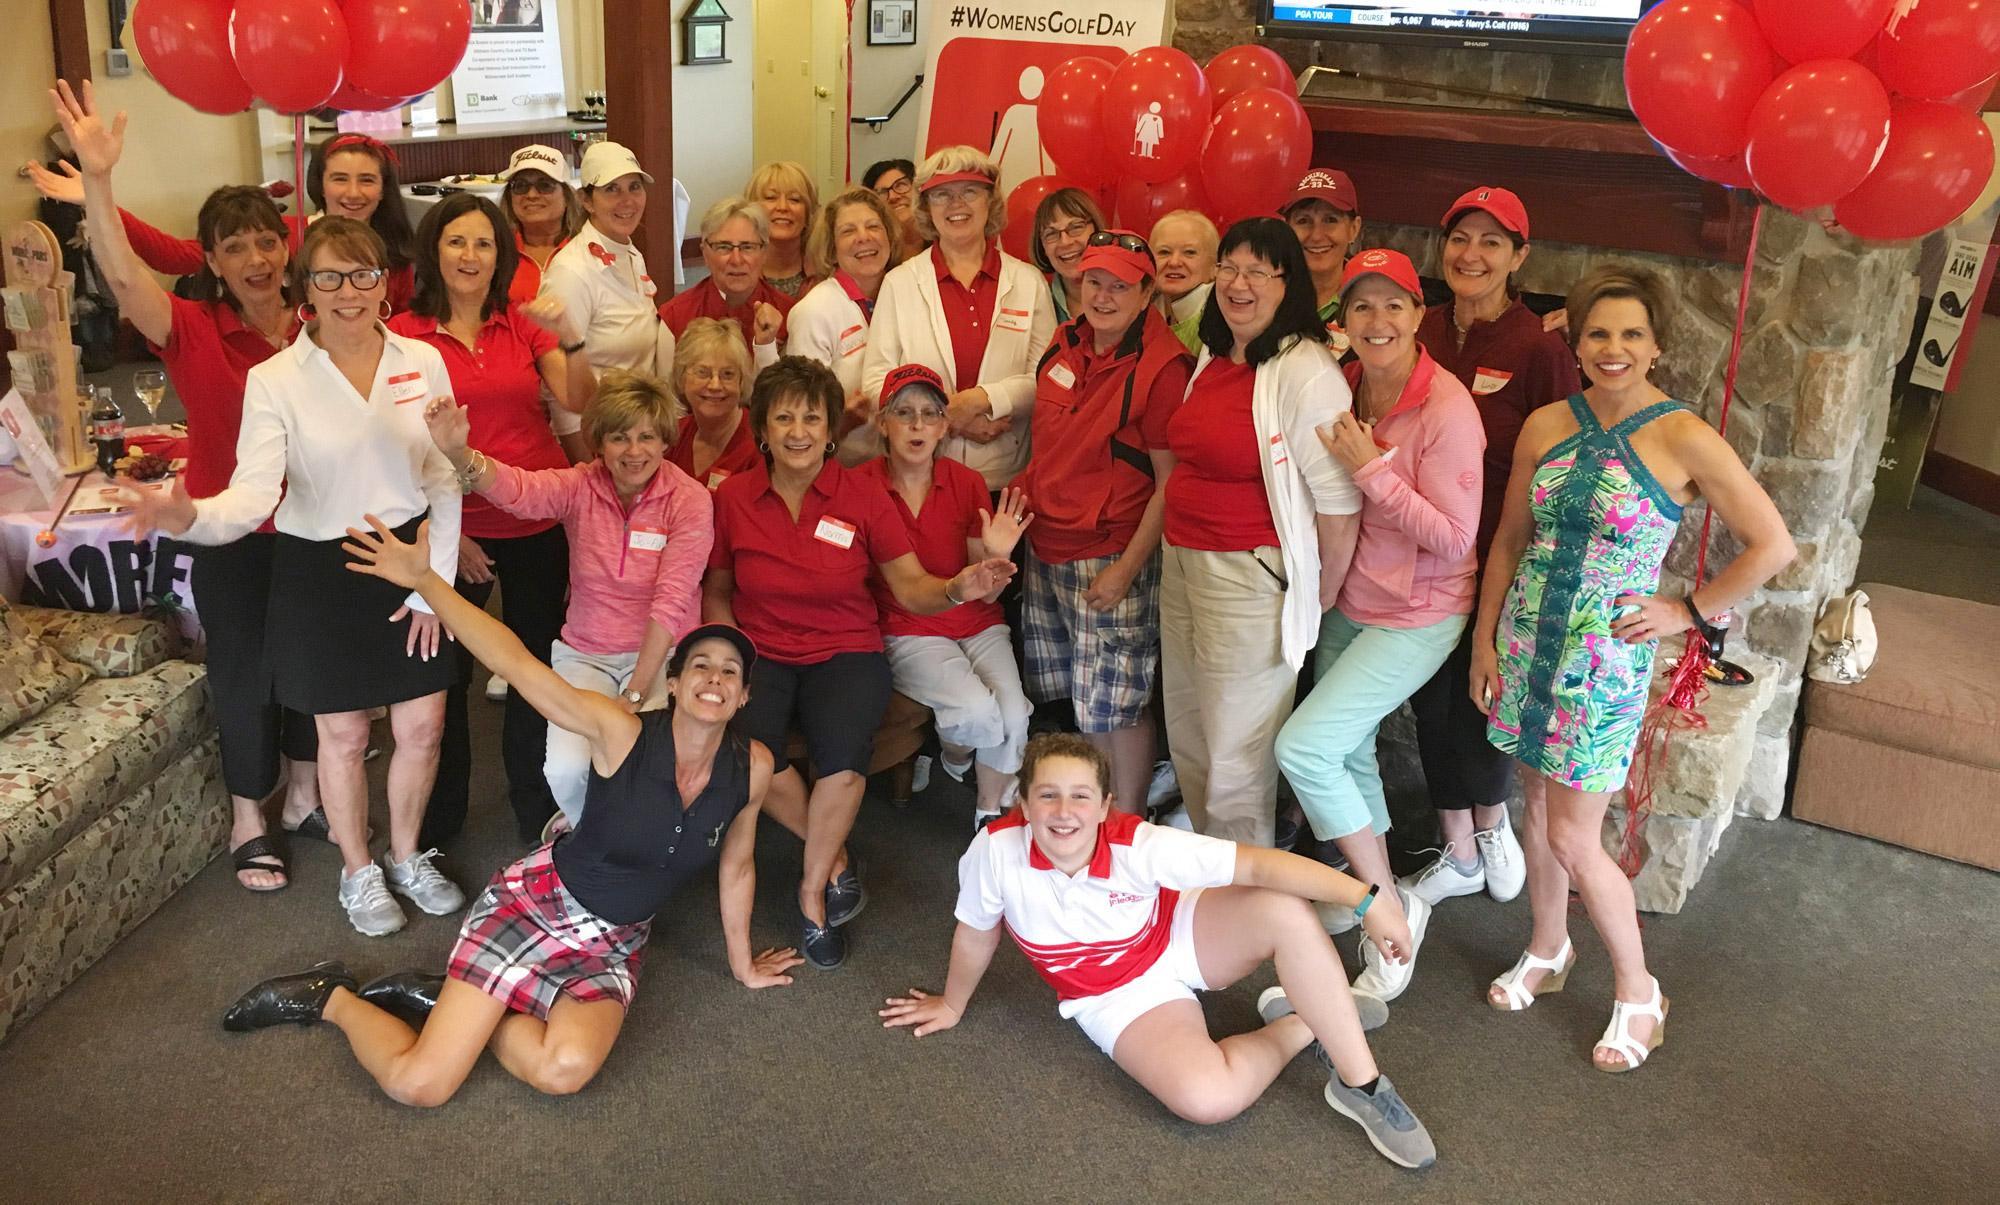 Women's Golf Day JUNE 1, 2021 at Atkinson Resort